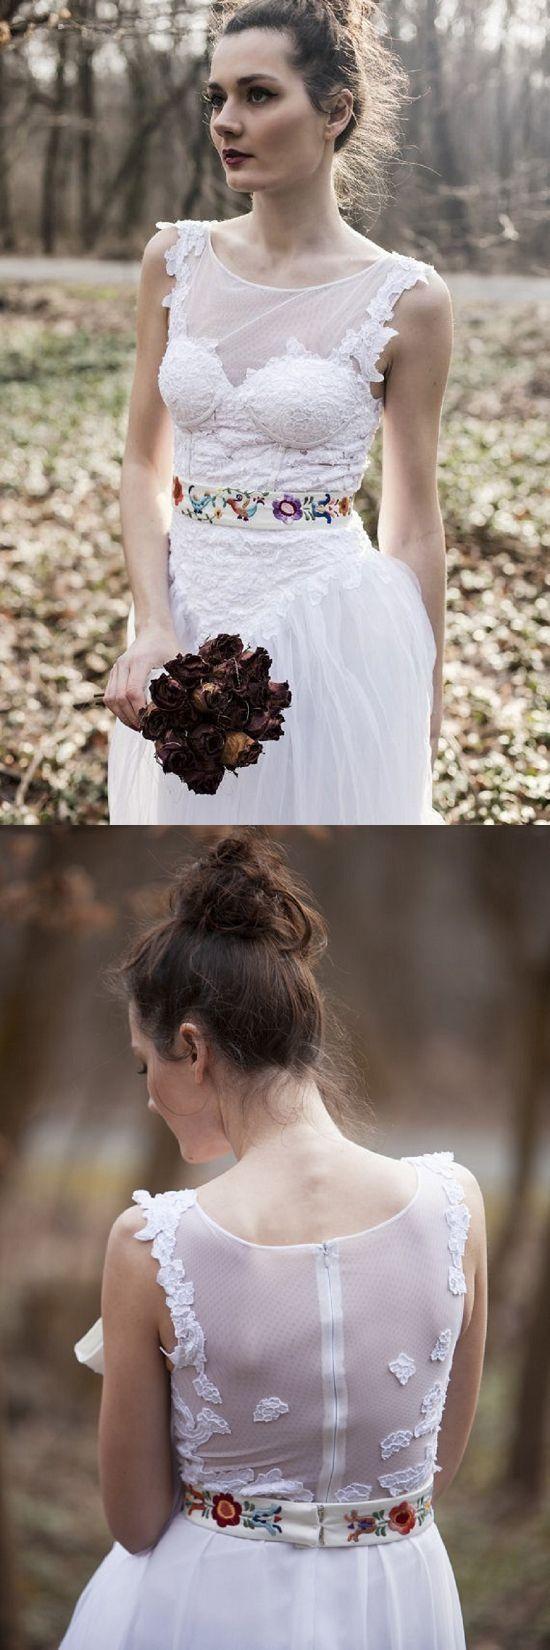 mexican wedding dress13